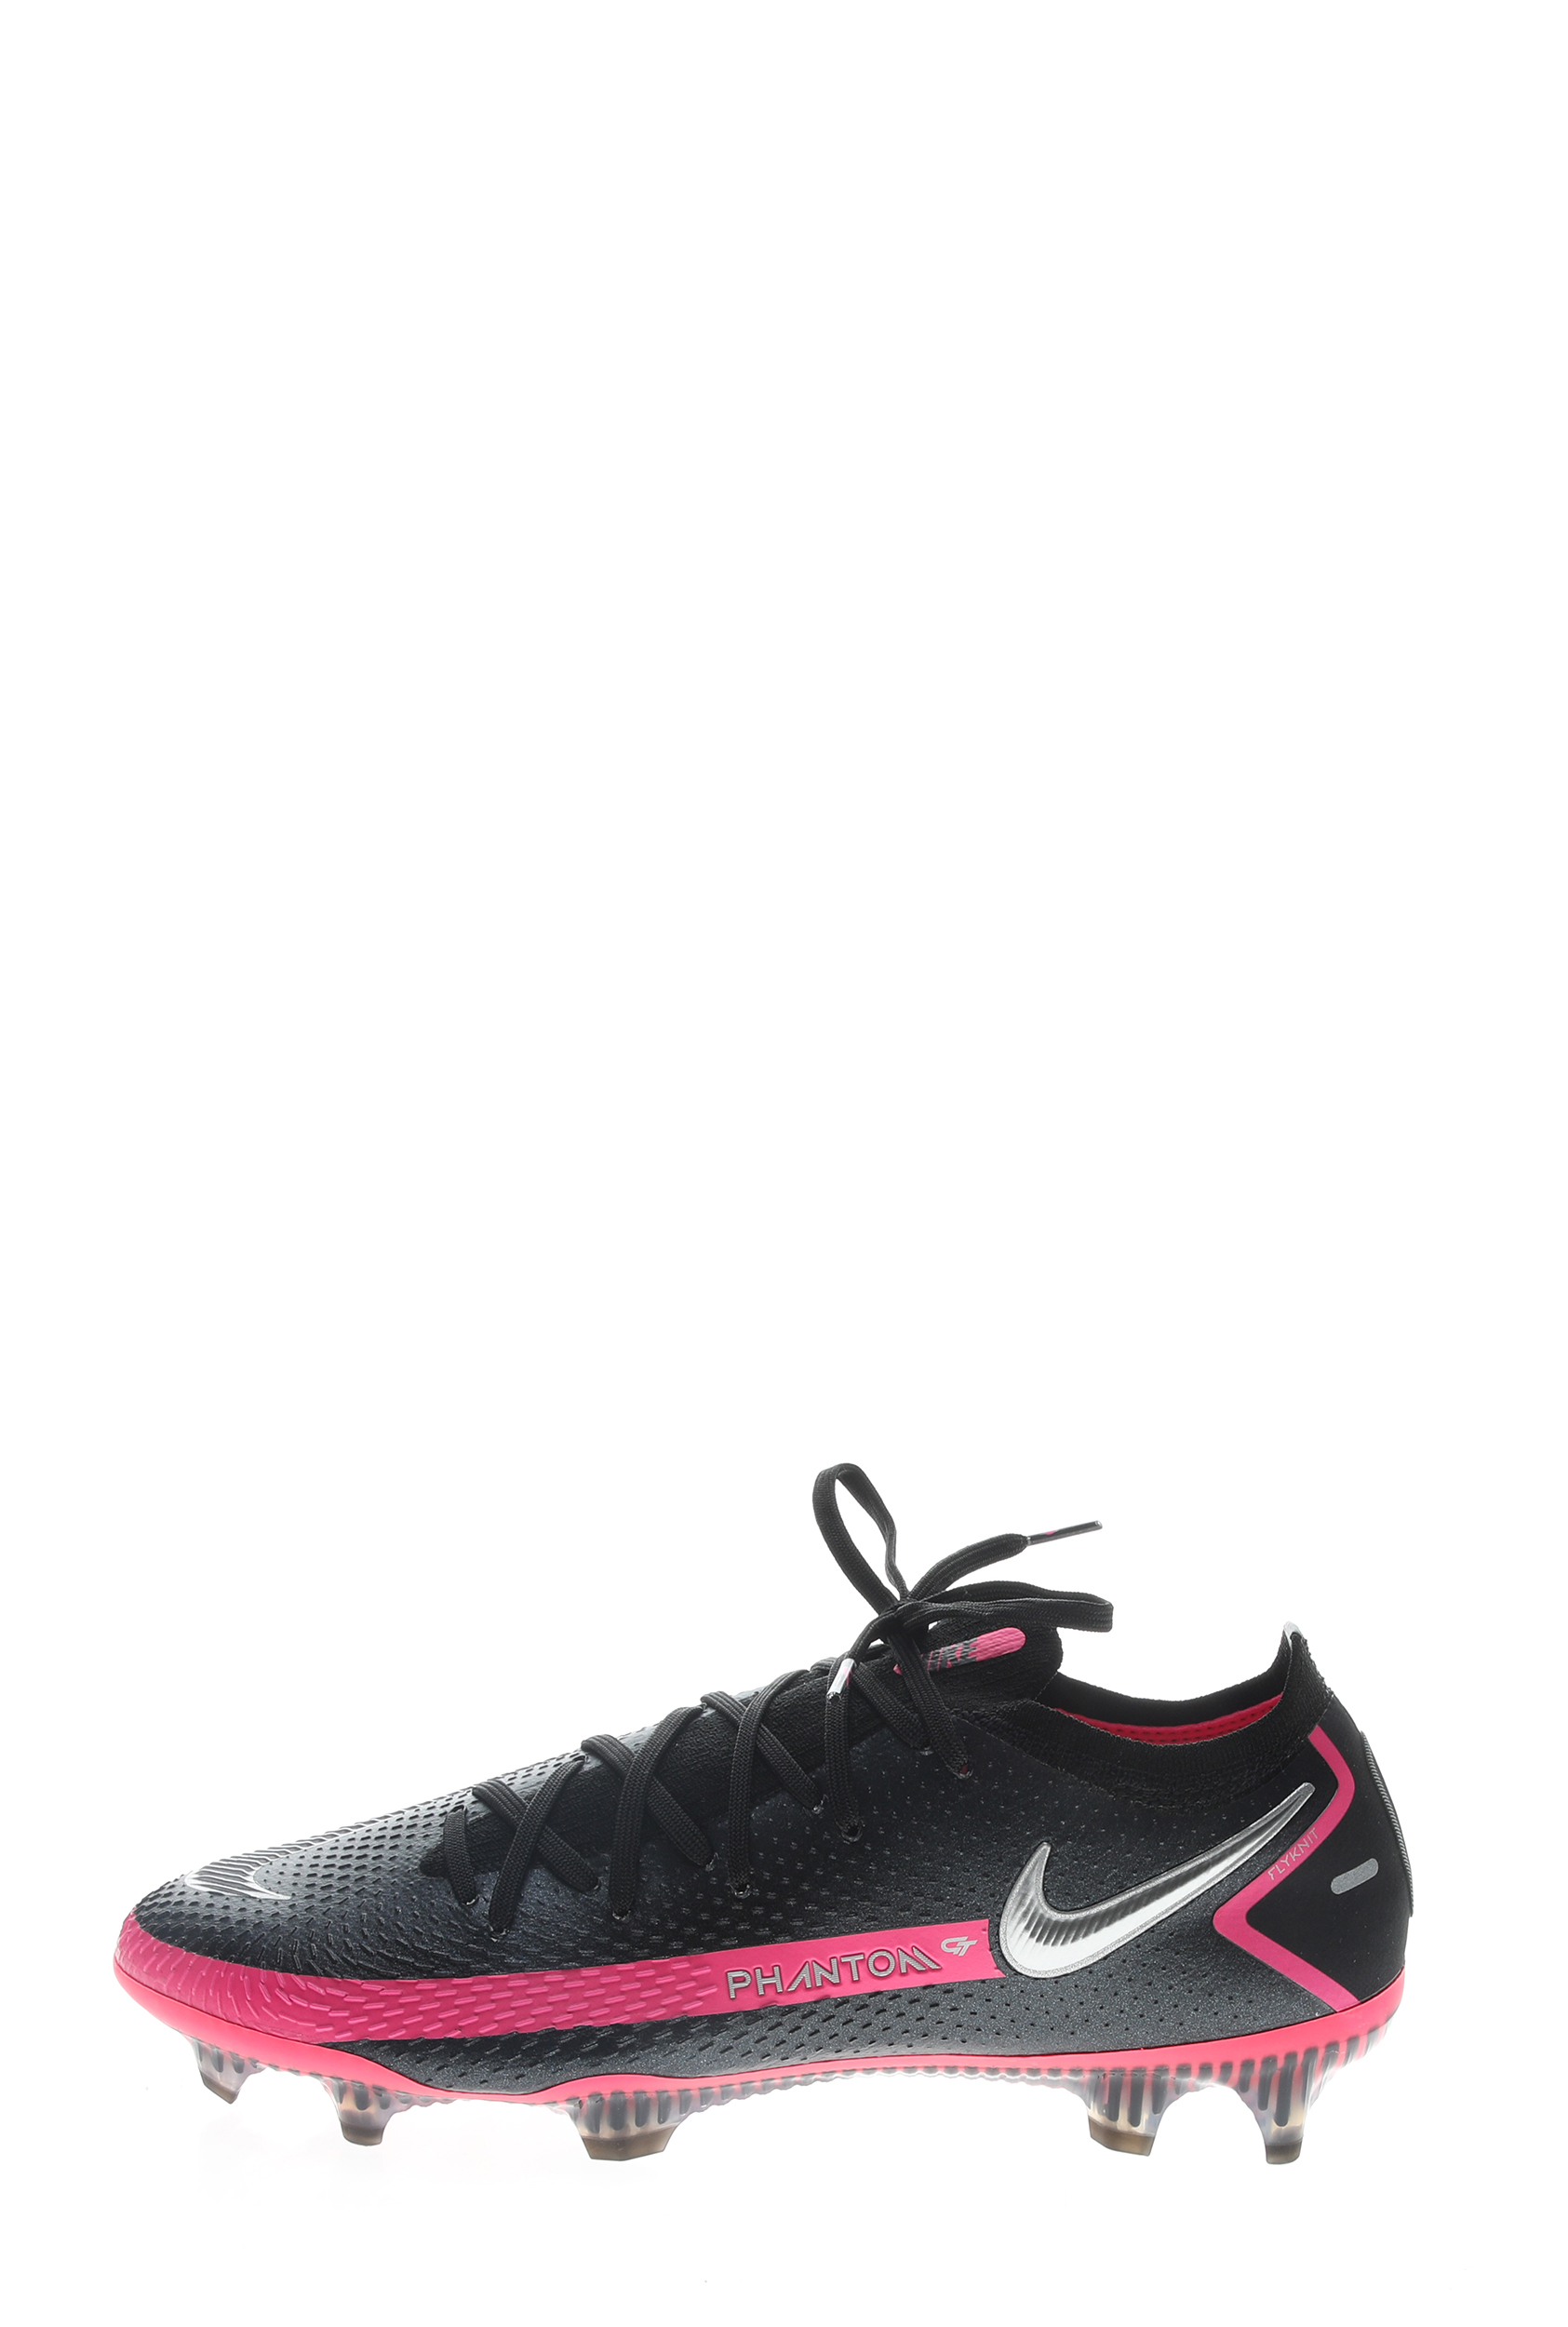 NIKE – Unisex παπούτσια ποδοσφαίρου NIKE PHANTOM GT ELITE FG μαύρα